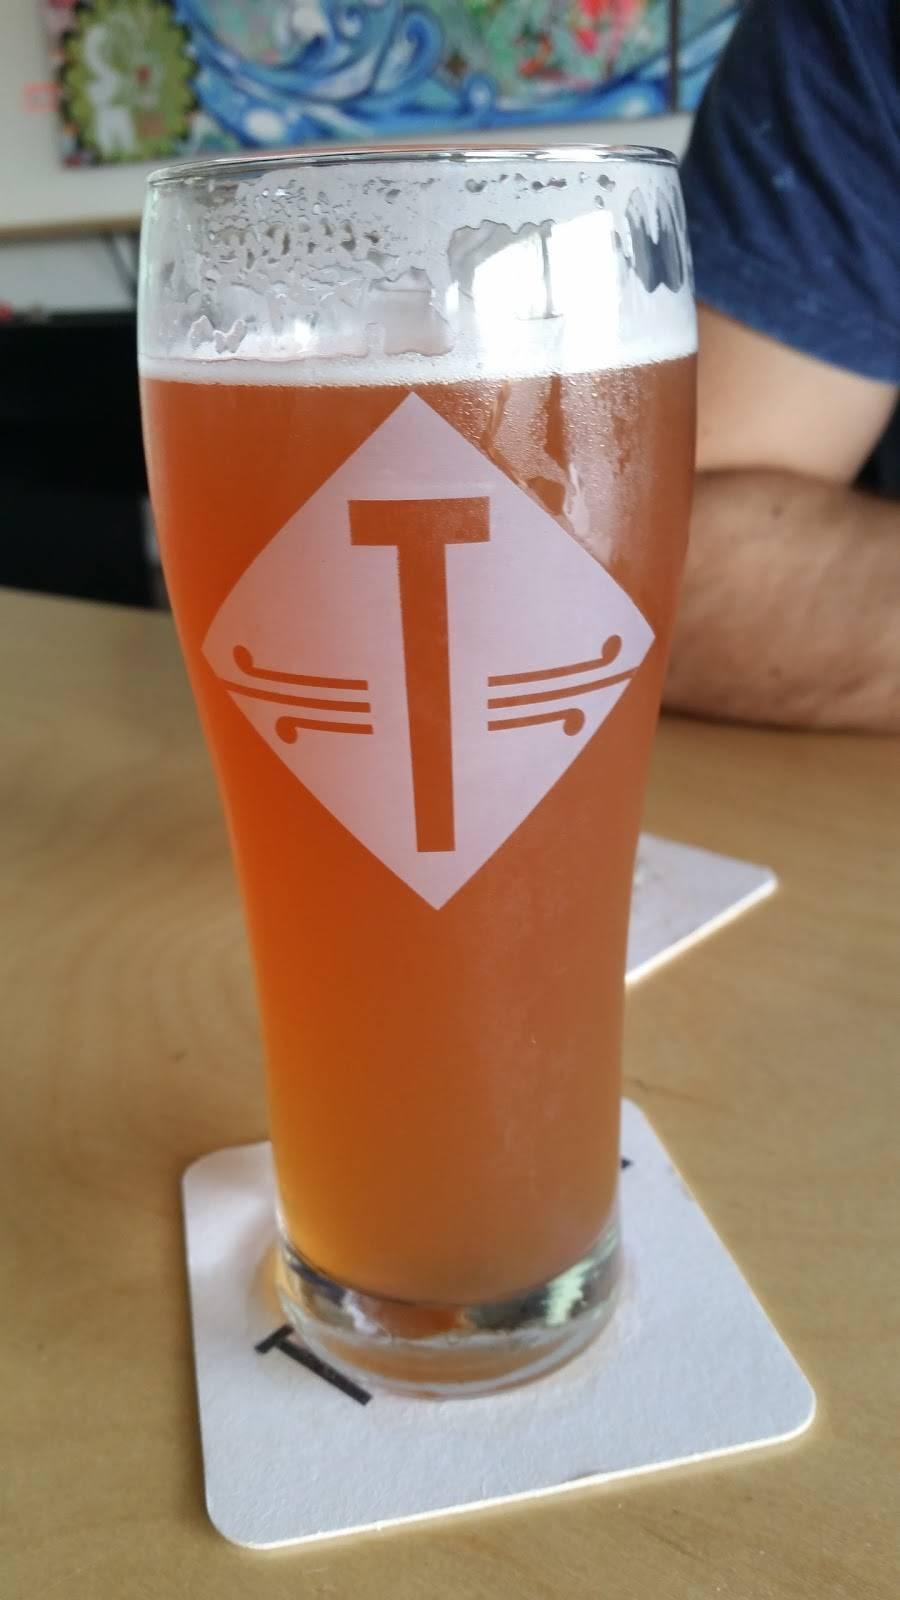 Temperance Beer Co. | restaurant | 2000 Dempster Street, Evanston, IL 60202, USA | 8478641000 OR +1 847-864-1000